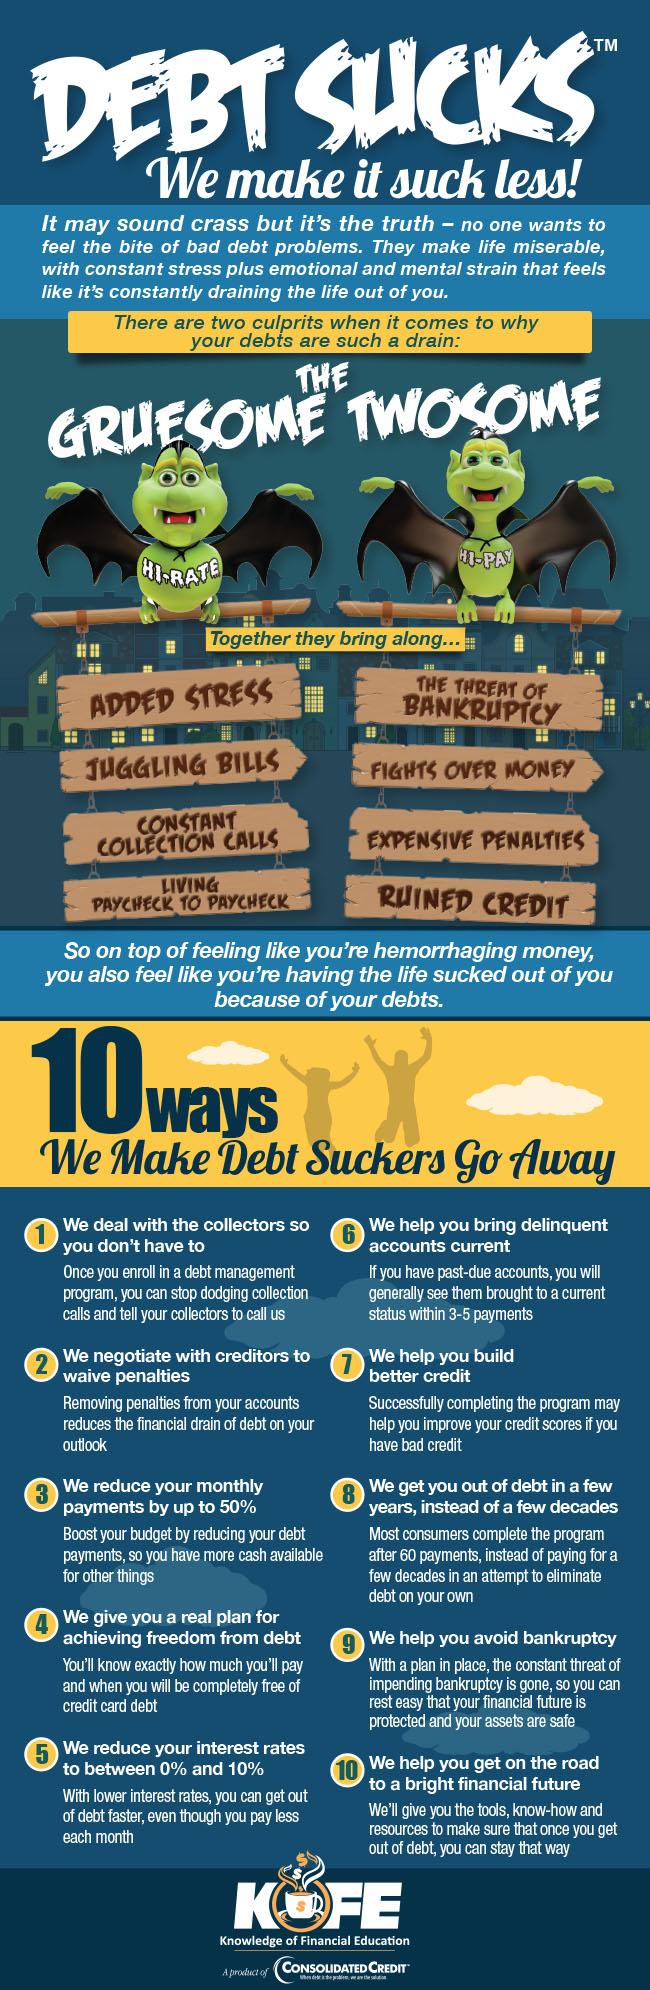 Debt Sucks infographic